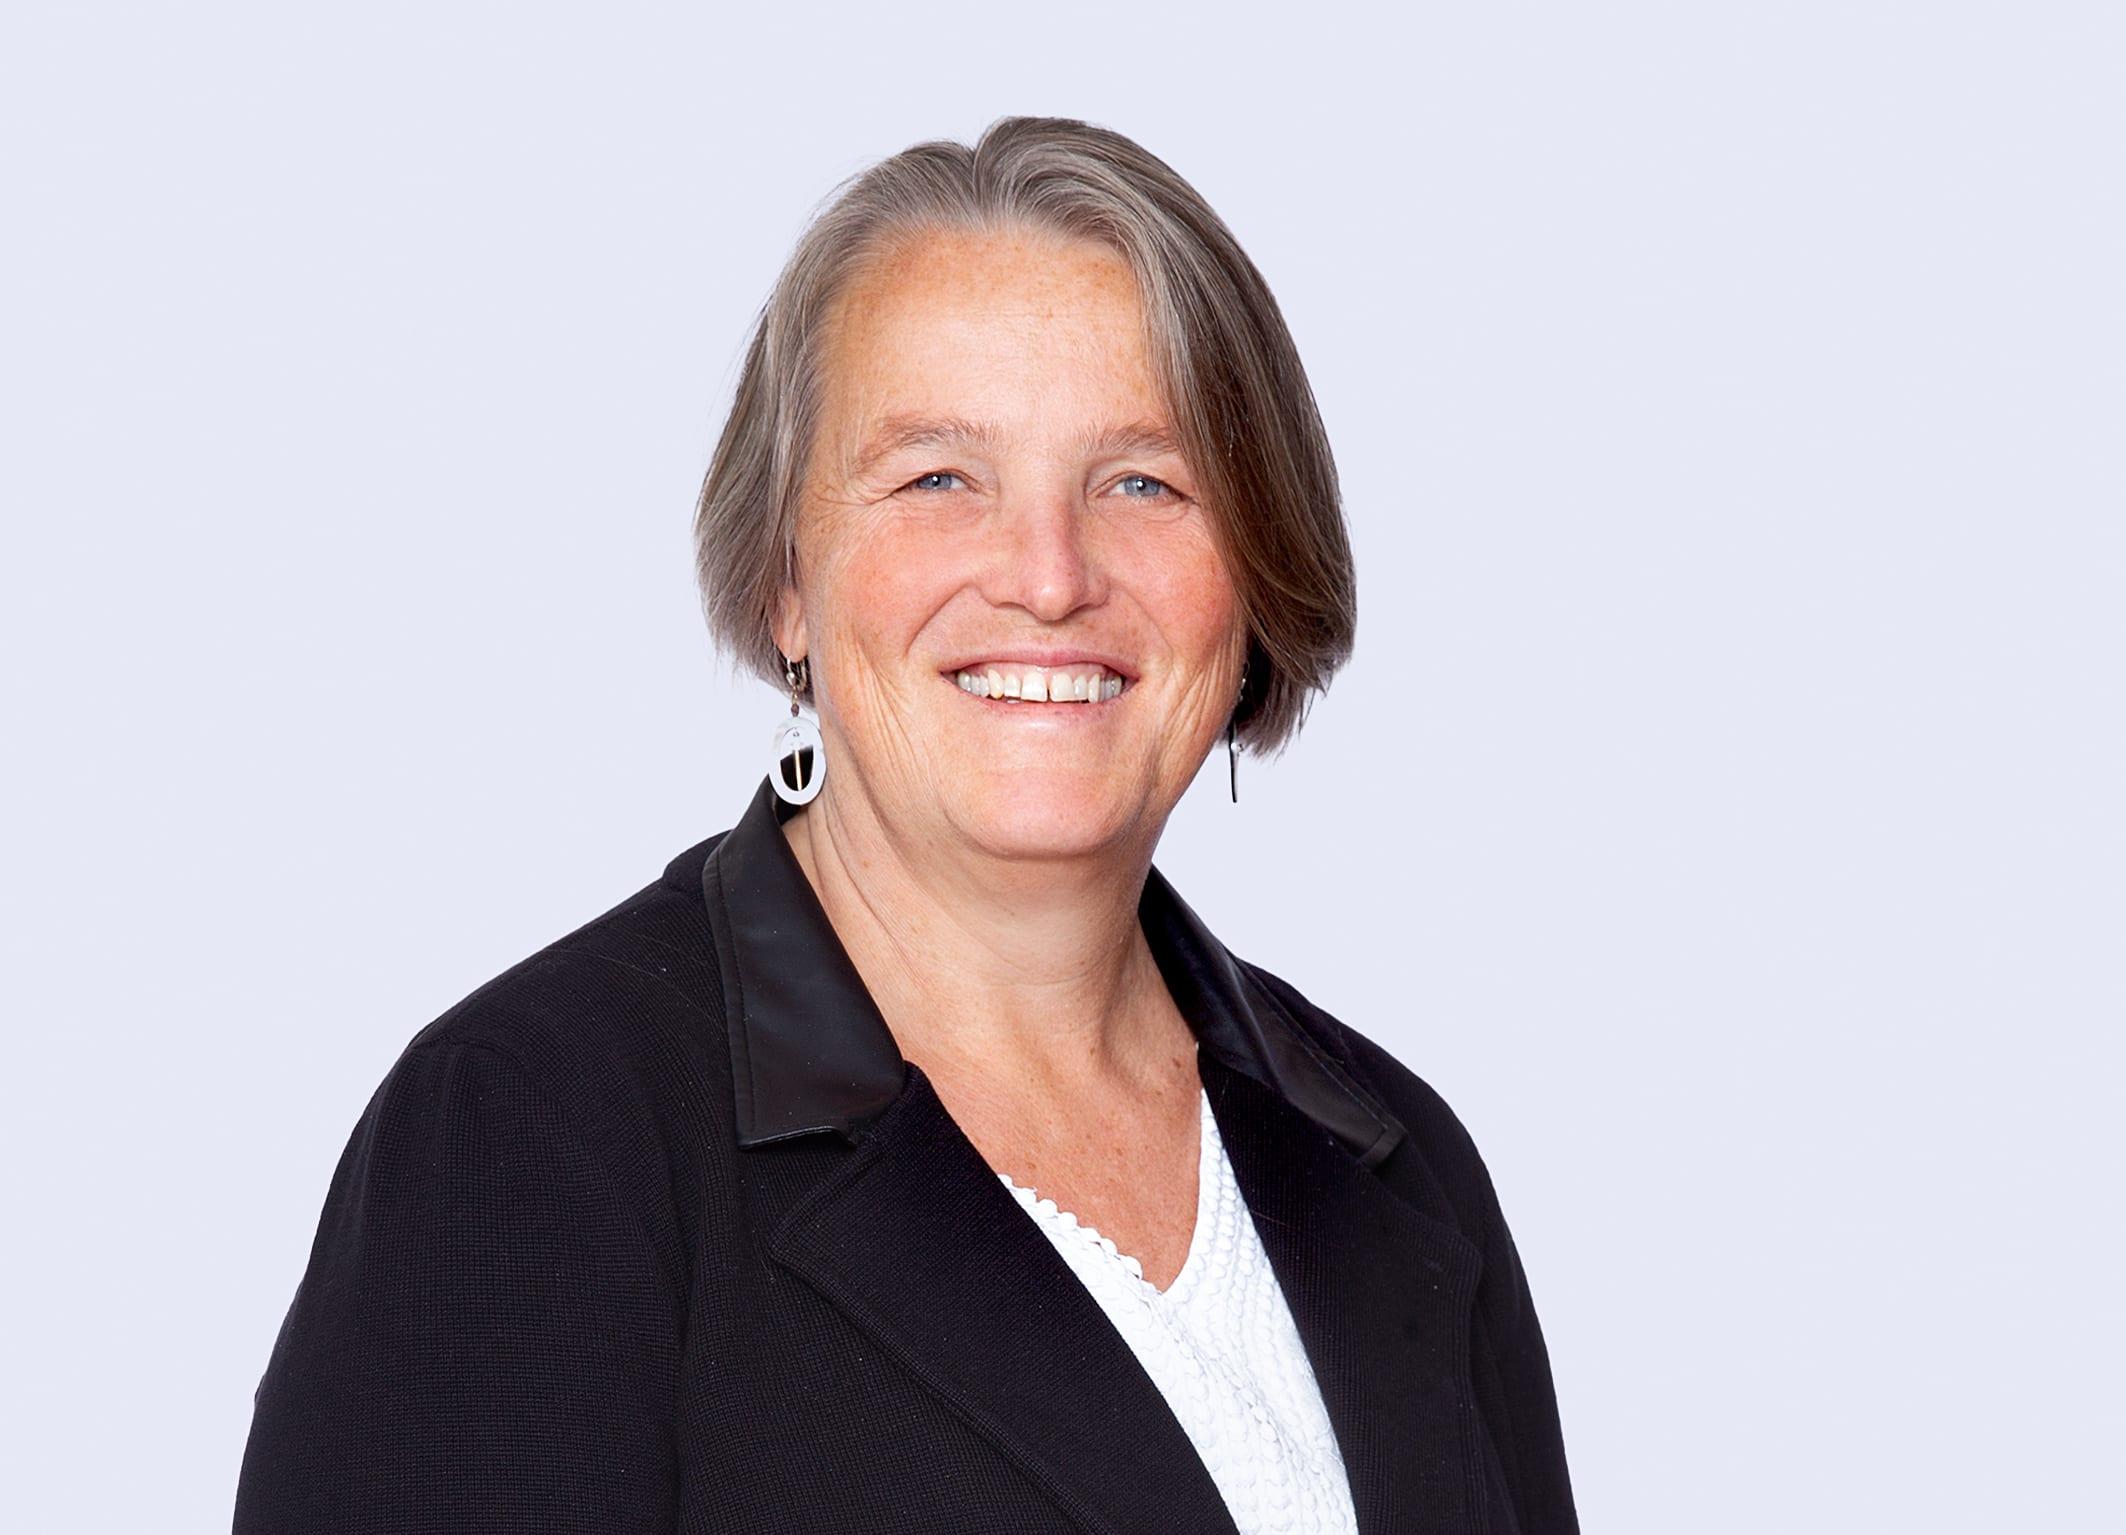 Sigrid Brynestad